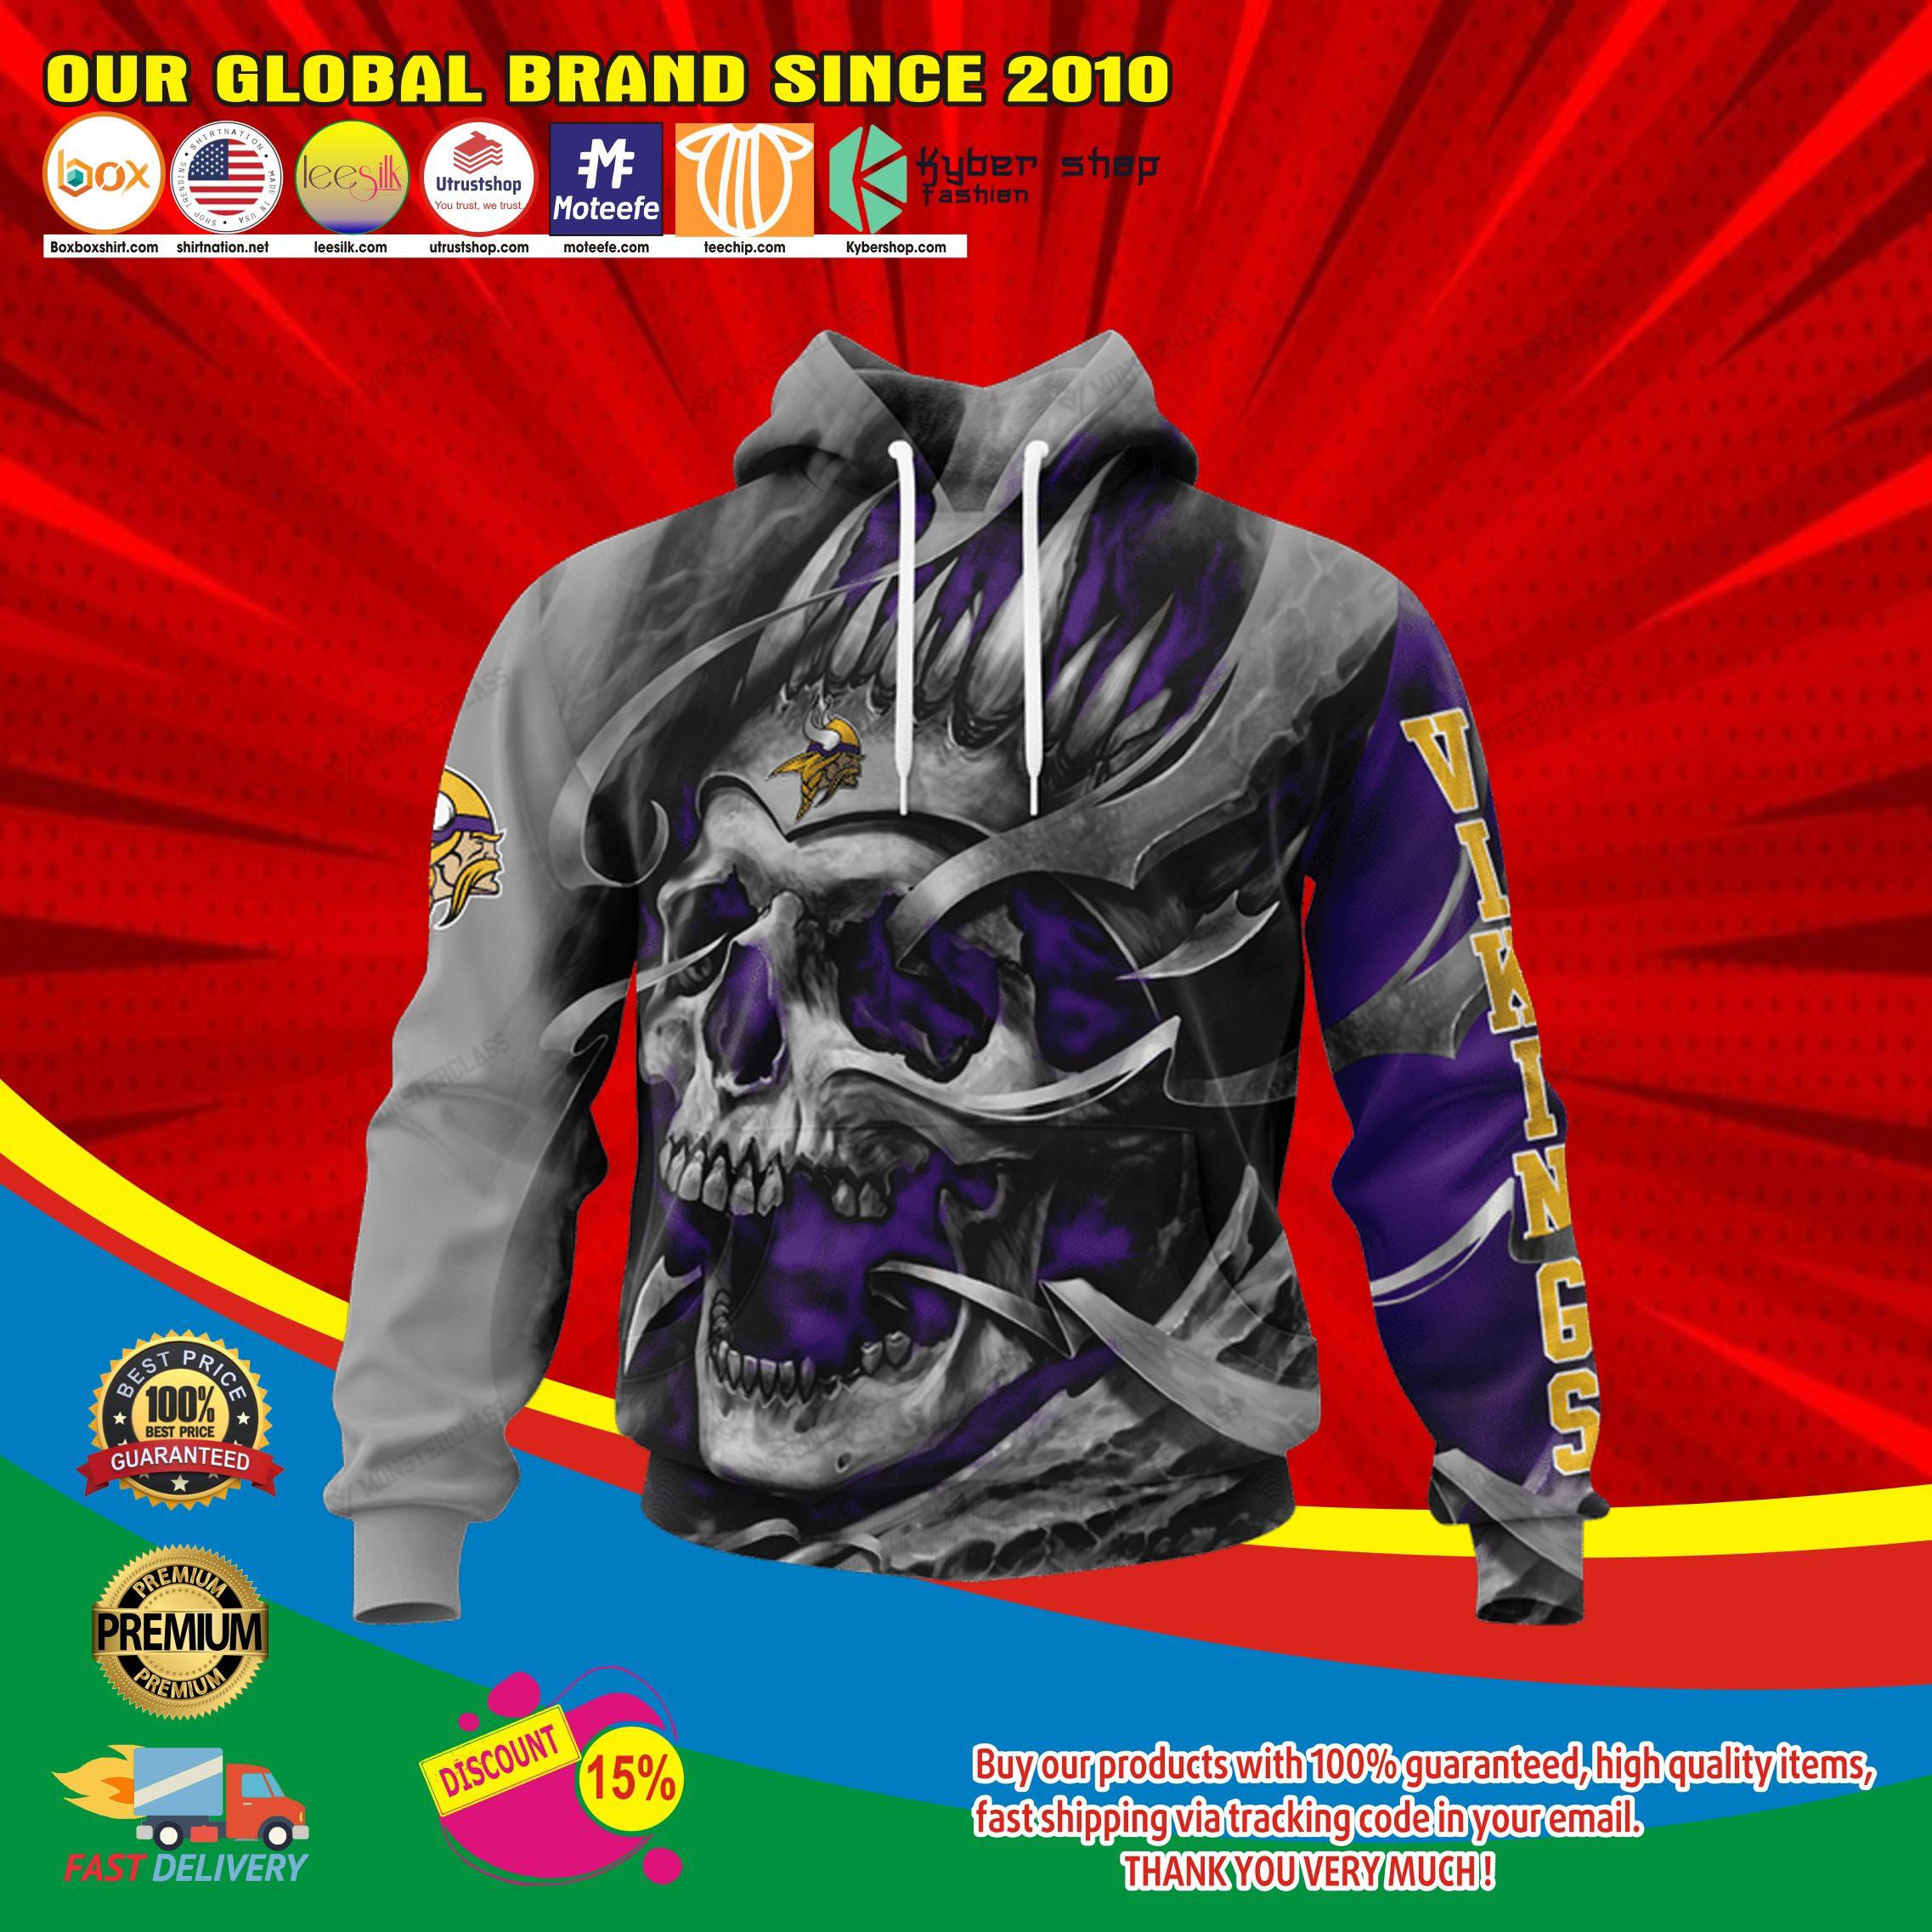 Minnesota viking skull jersey hoodie4